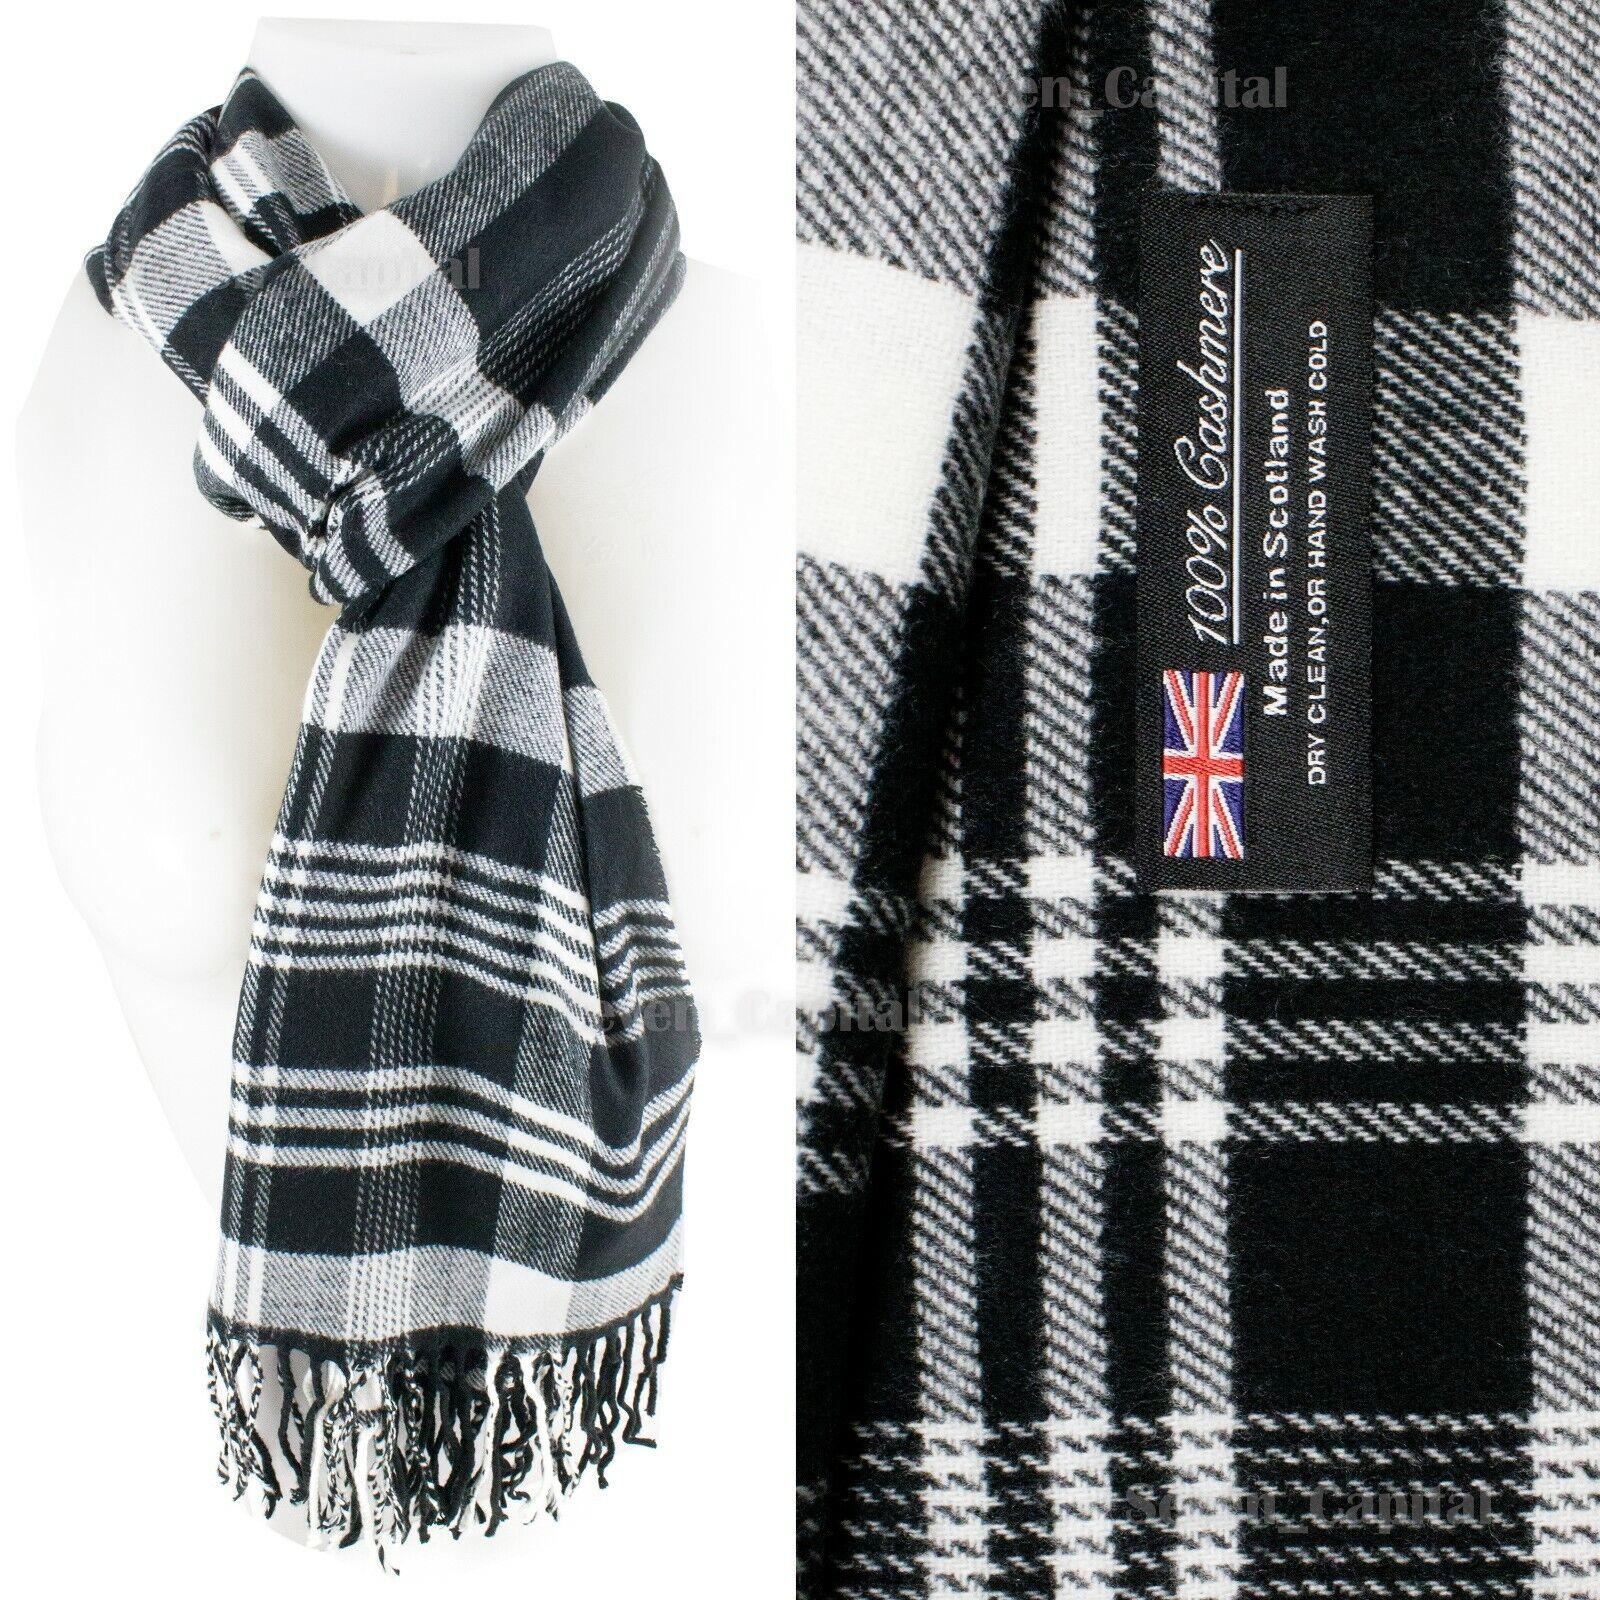 Mens Womens Winter Warm SCOTLAND Made 100% CASHMERE Scarf Scarves Plaid Wool 29. Plaid: Black/white